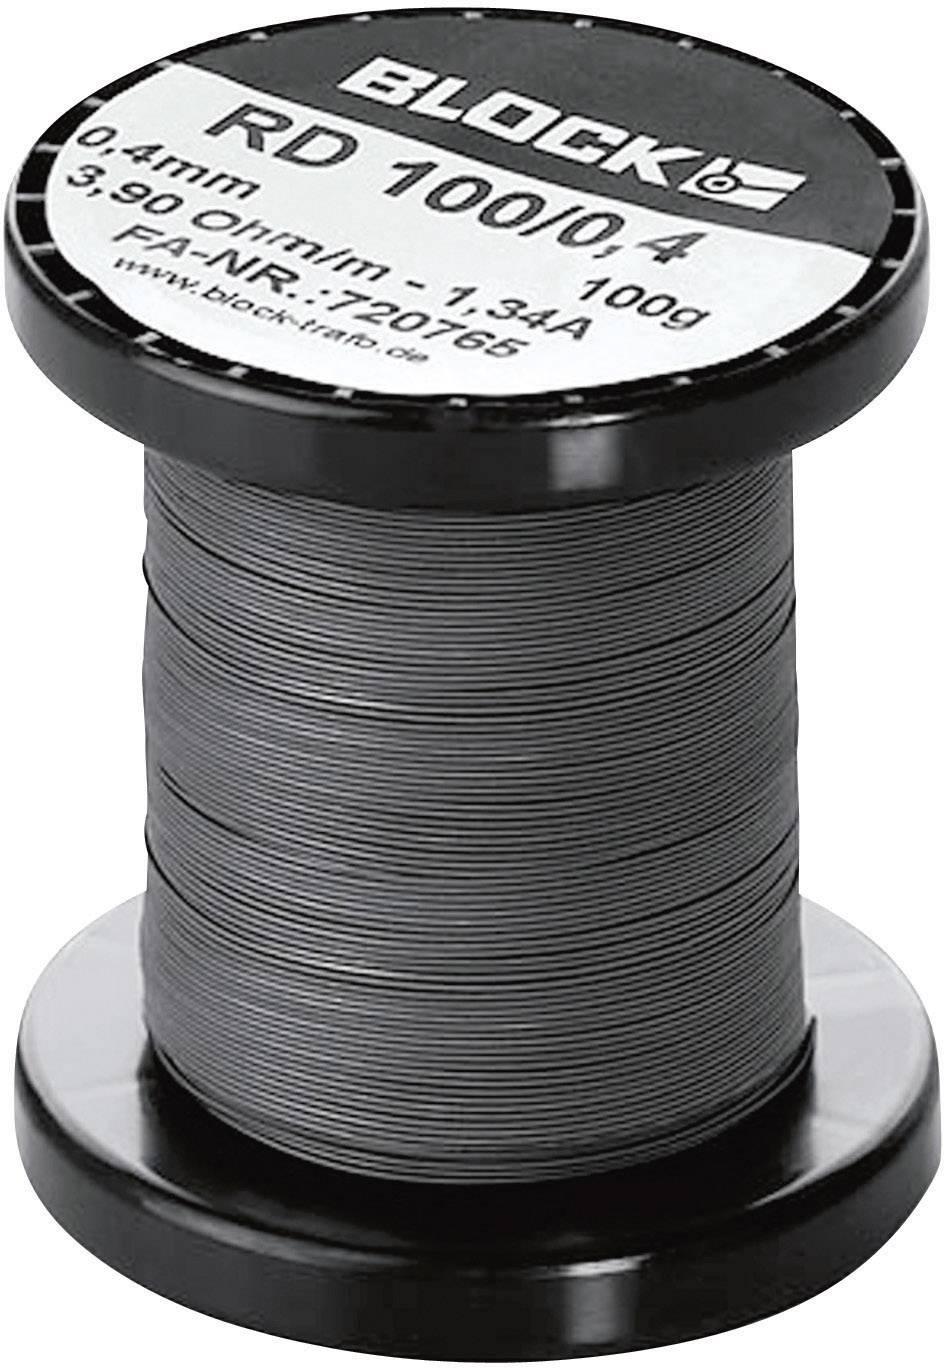 Odporový drát (konstantan) 0.156 Ω/m Block RD 100/2,0 3.5 m